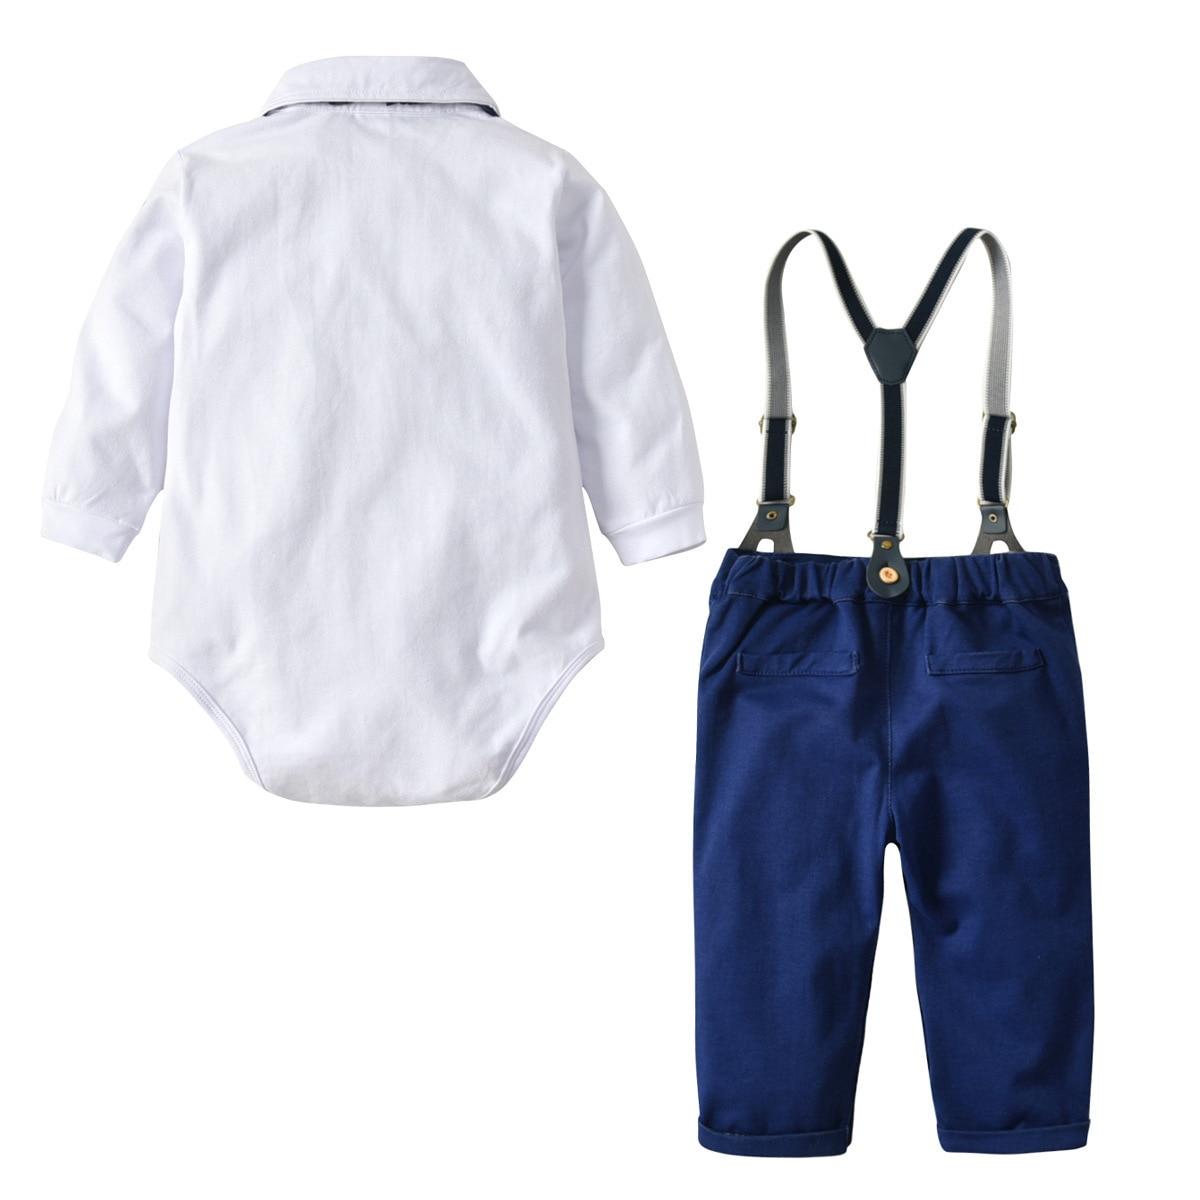 Boy Baby Clothes Set Autumn Newborn Glentmen Bodysuit with Straps Trousers Toddler Boys Clothing Infant Boys Party Clothes Suit